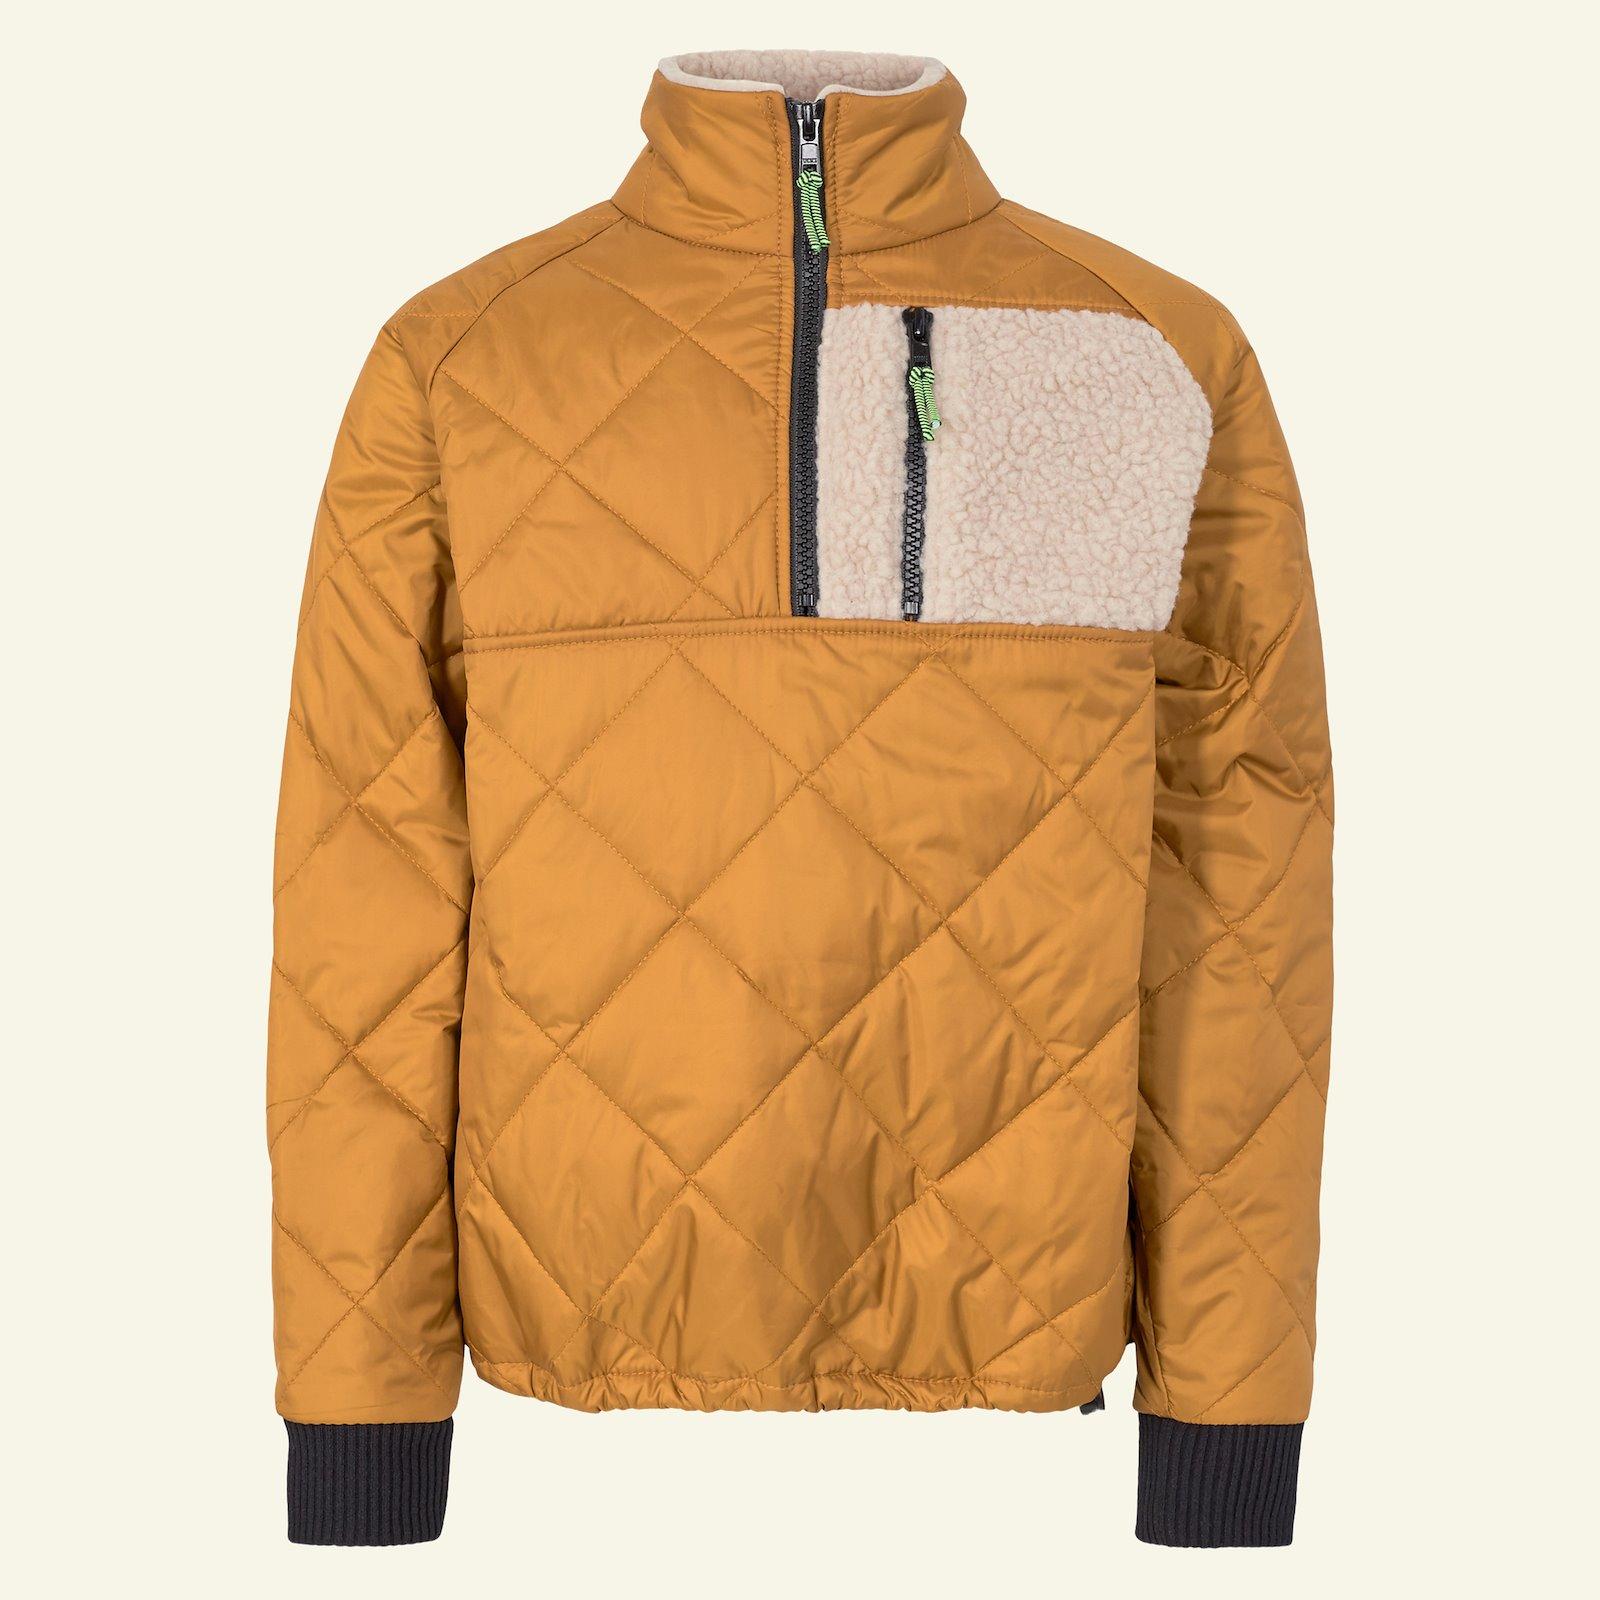 Anorak and jacket, 128/8y p64020_920218_910273_3509072_sskit